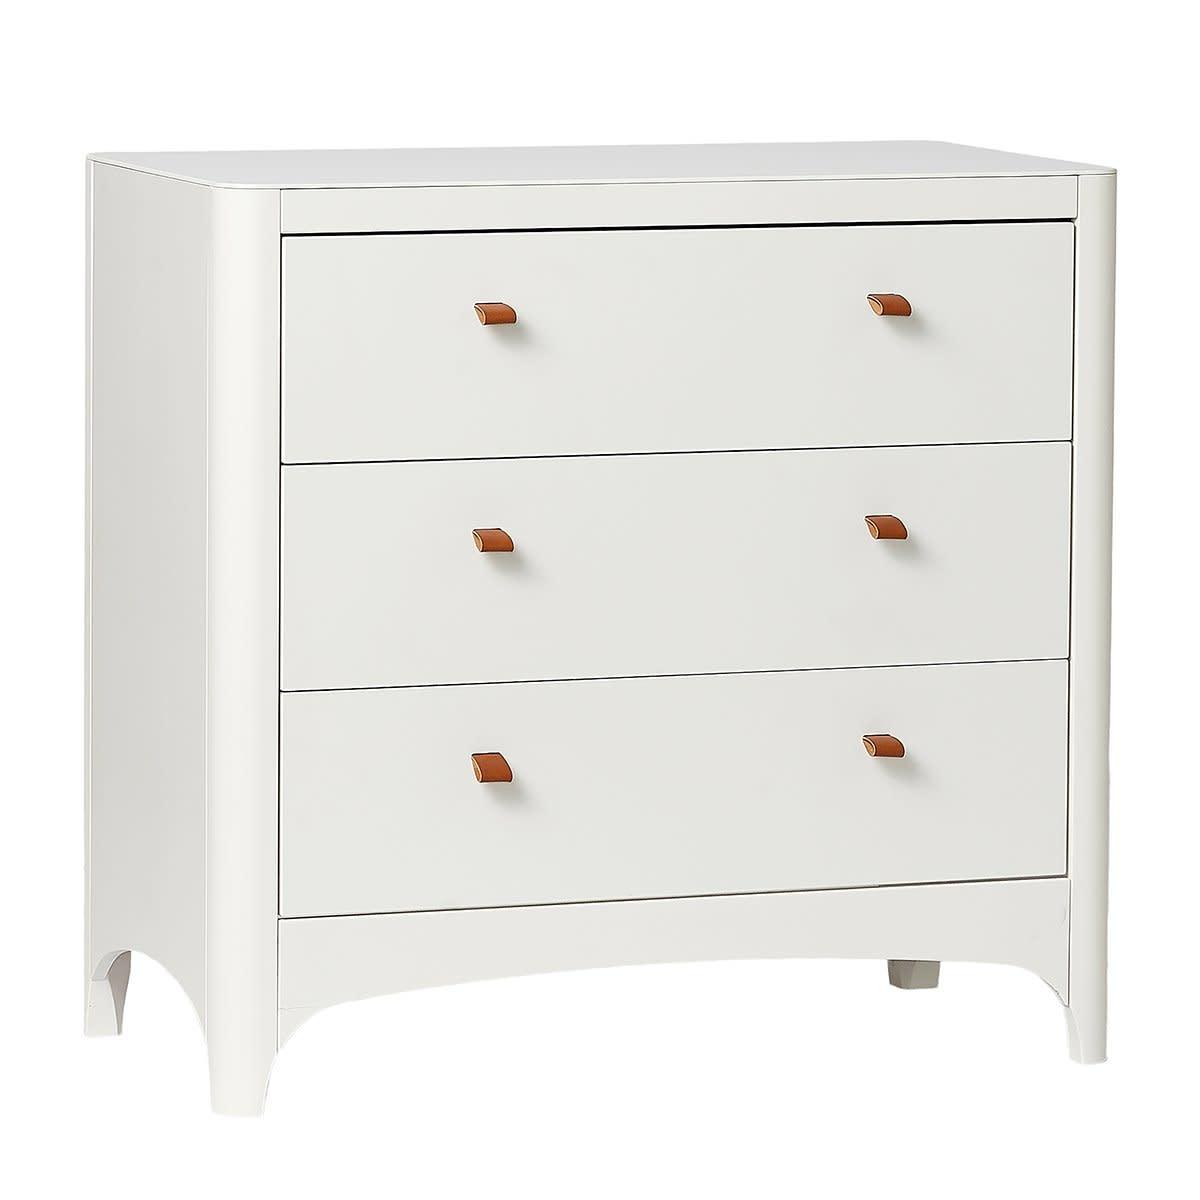 Leander Leander 3 Drawer Dresser - White